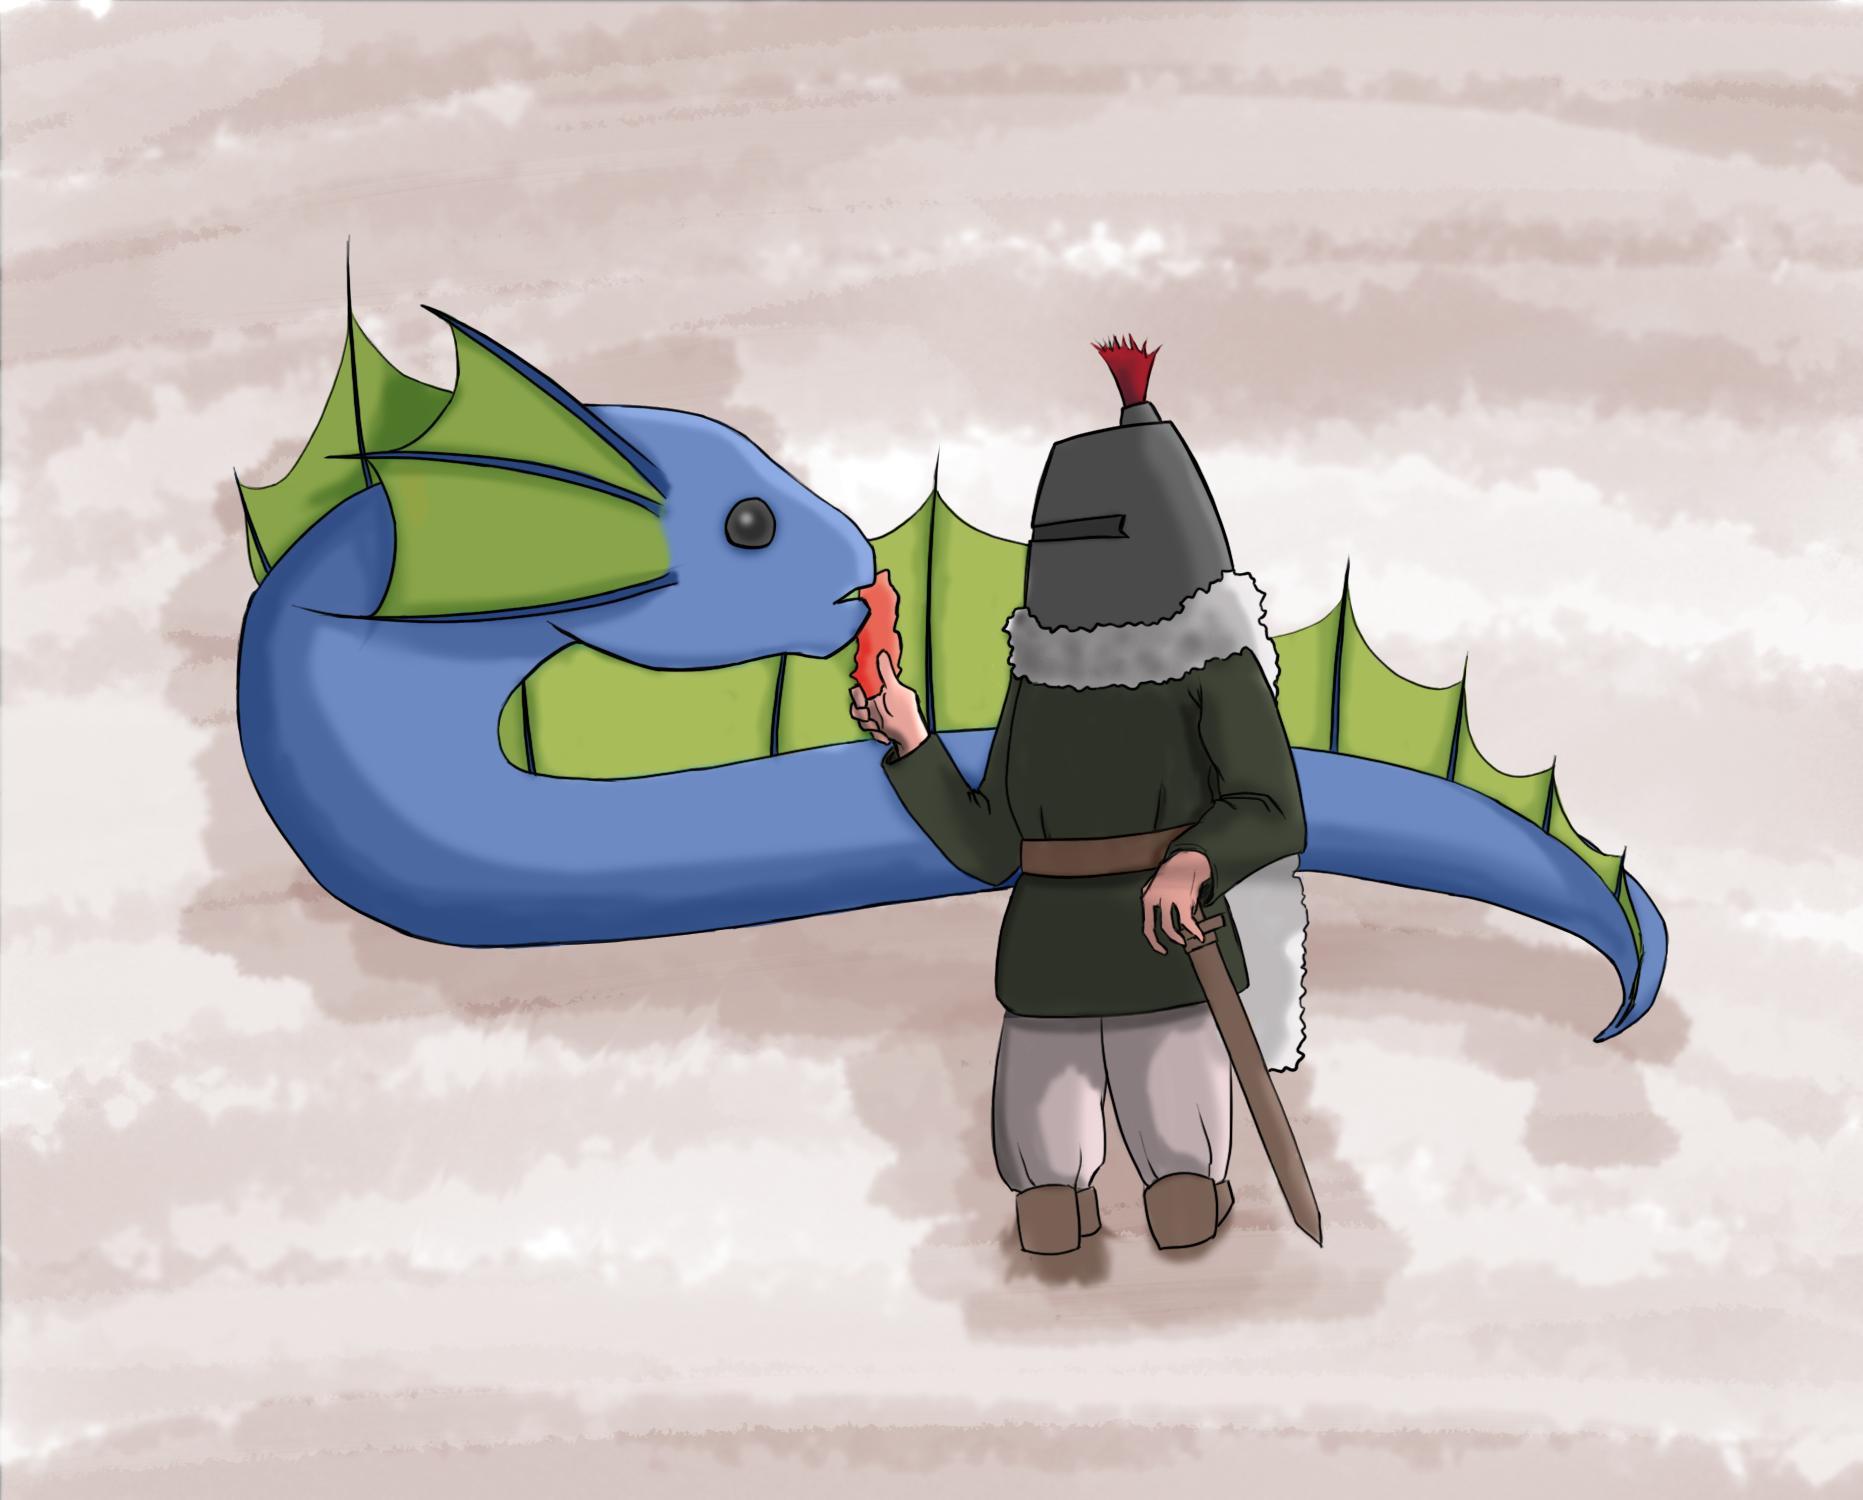 Nonstop knight concept